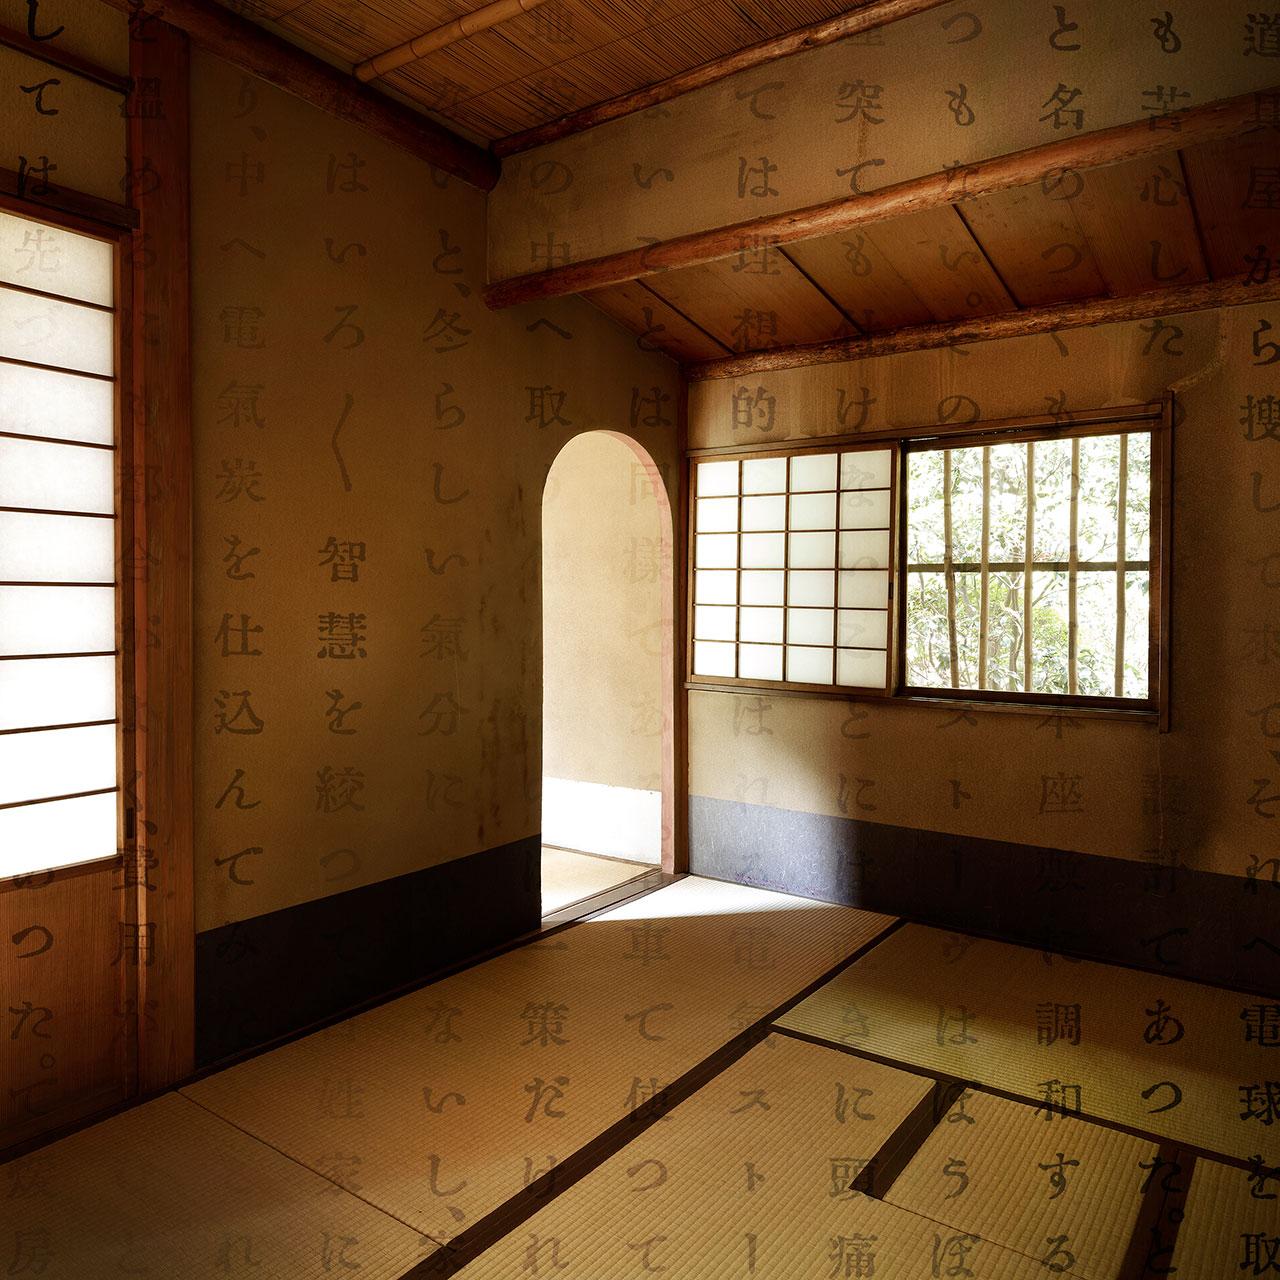 Inês d'Orey,Kosaka House #1.1938, Satagaya. 80x80cm. Photographic Fine Art Print.